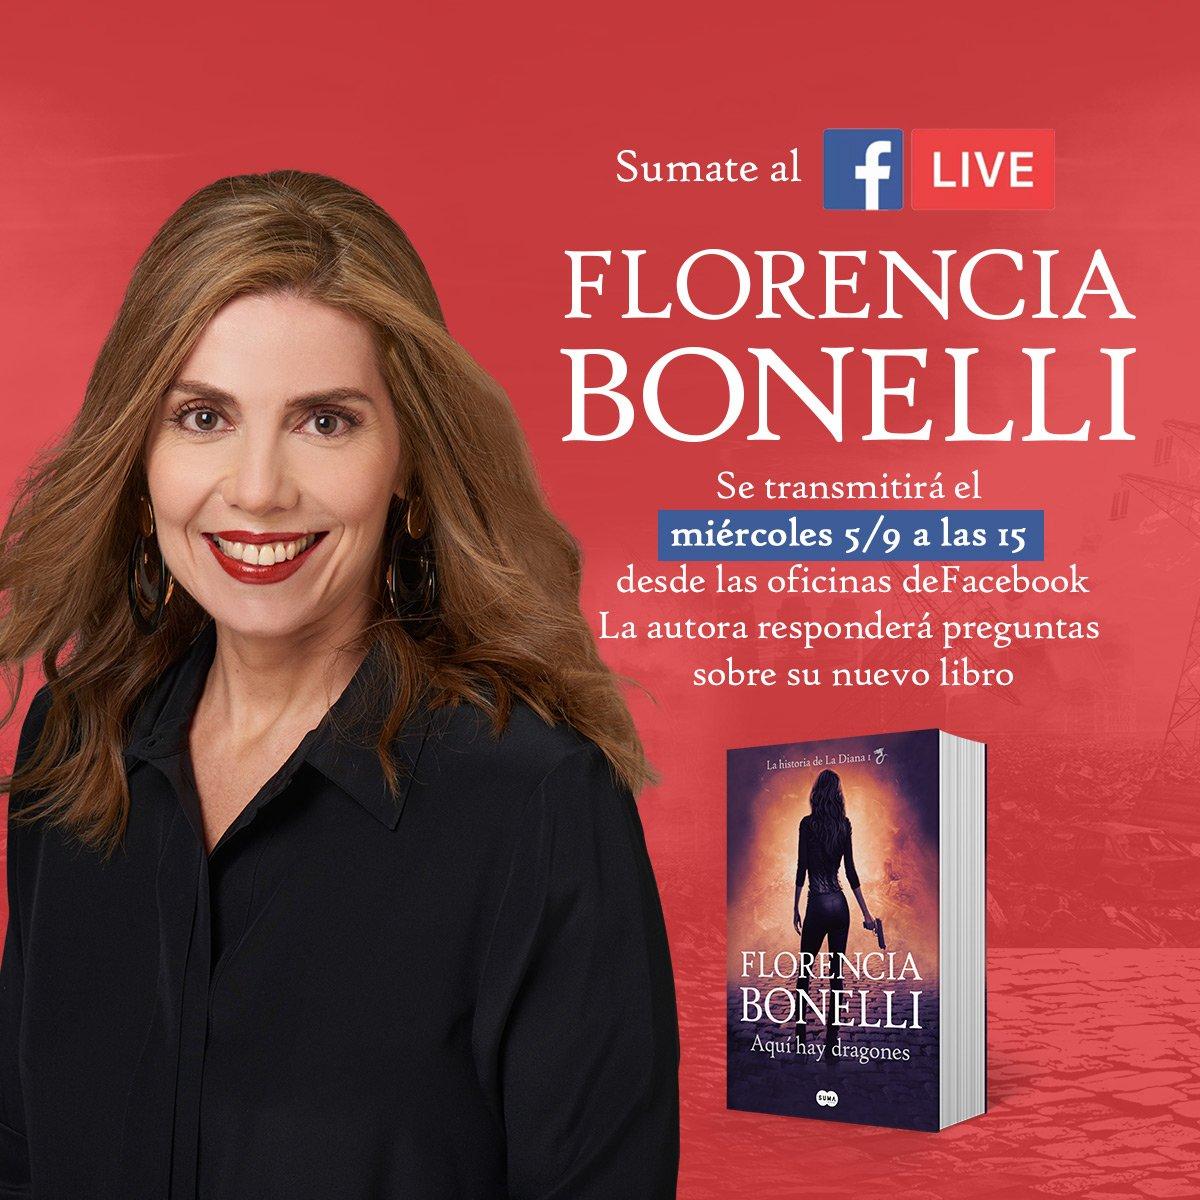 FLORENCIA BONELLI EPUB